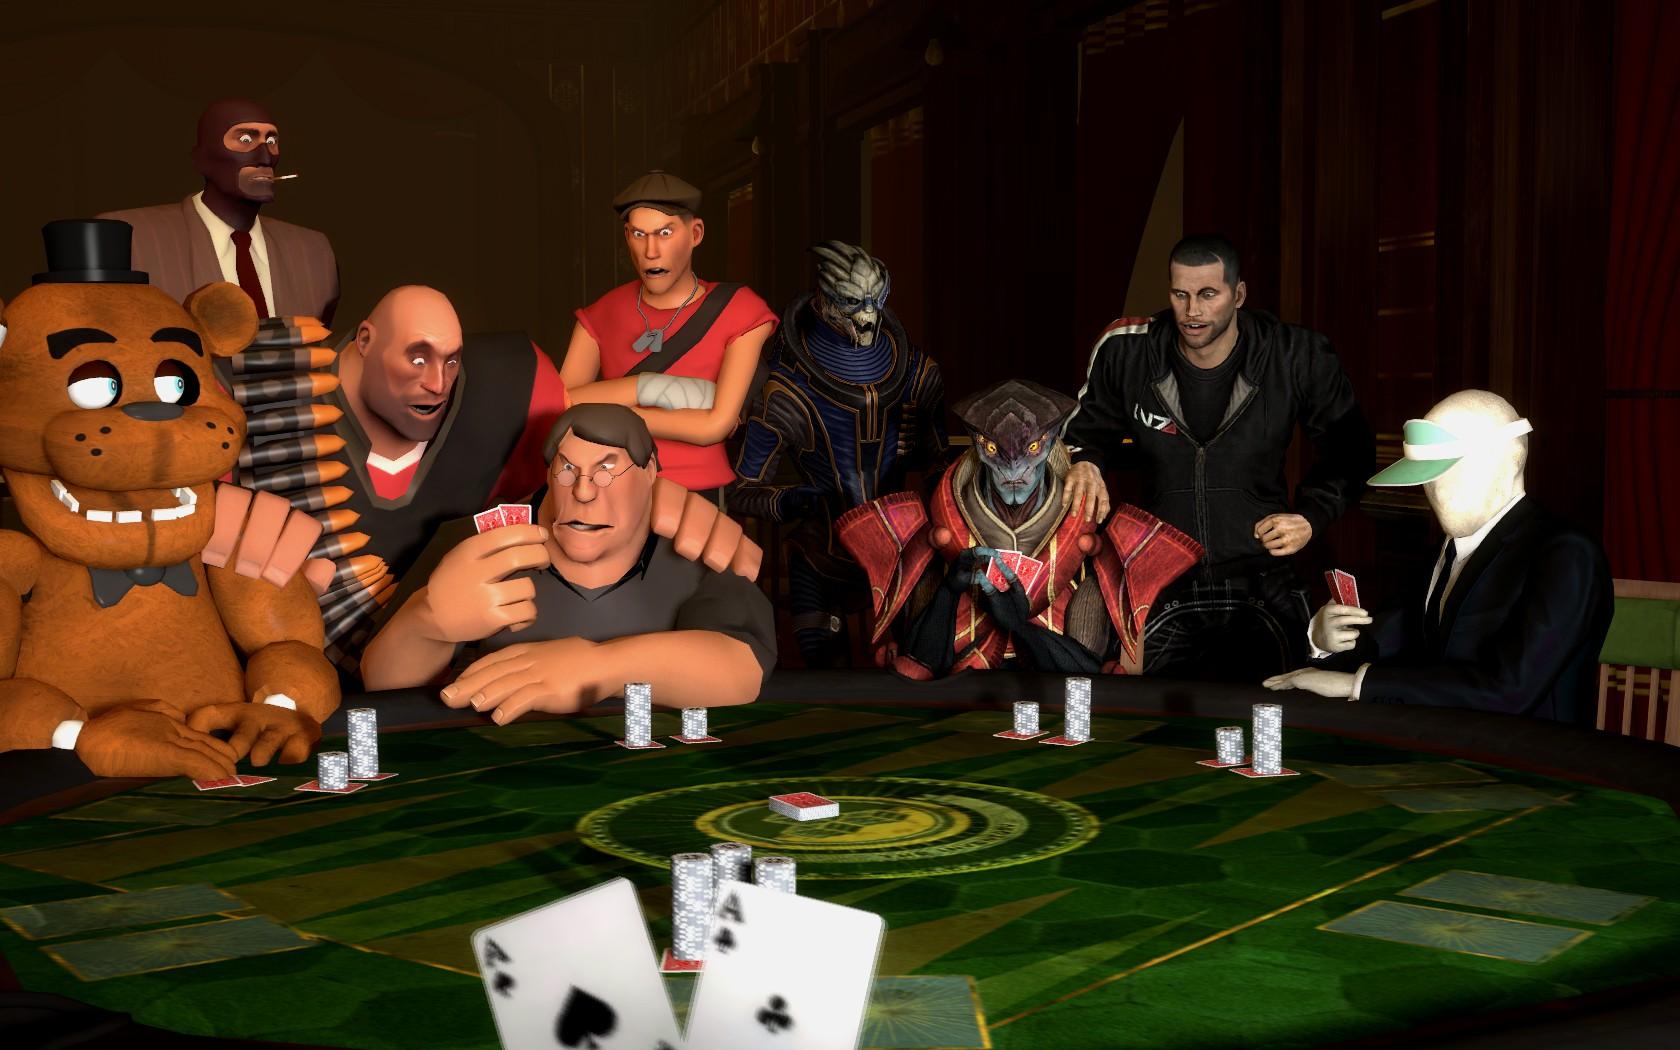 Poker Night 3. image - Garry's Mod 10 - Mod DB